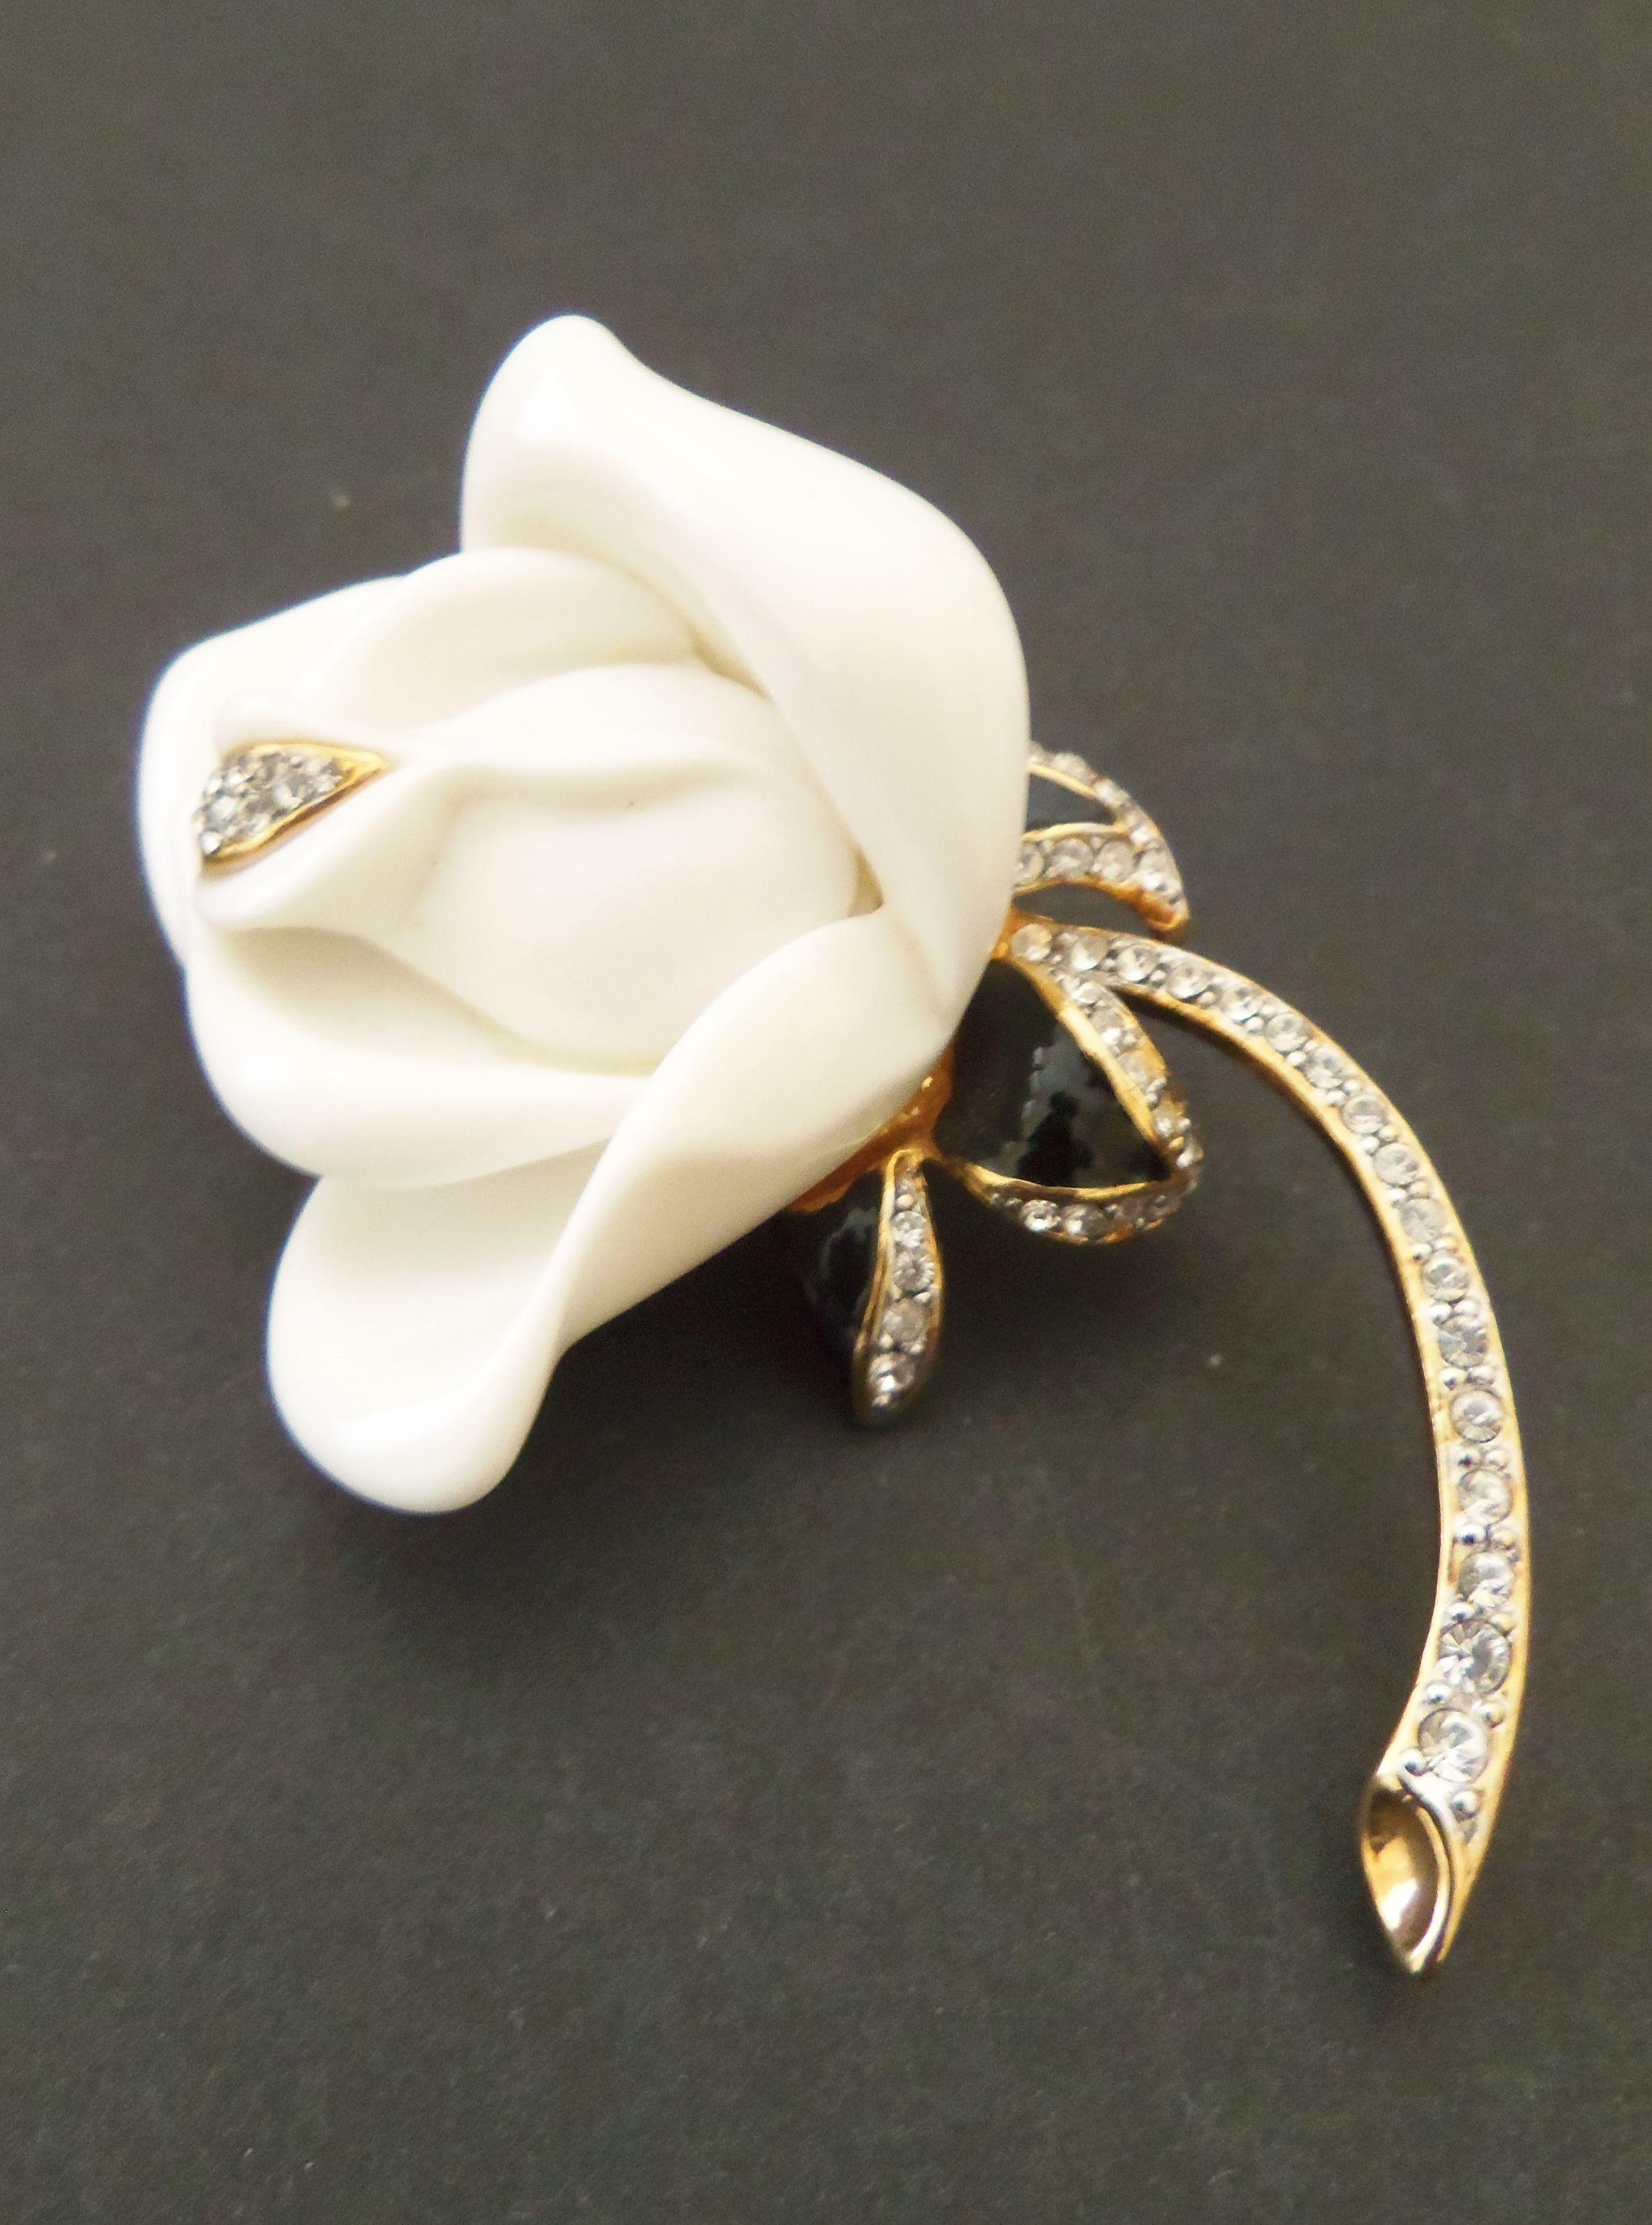 SOLD - Beautiful Small Vintage Gold Tone KJL Enamel Rhinestone Rosebud Brooch/Pin